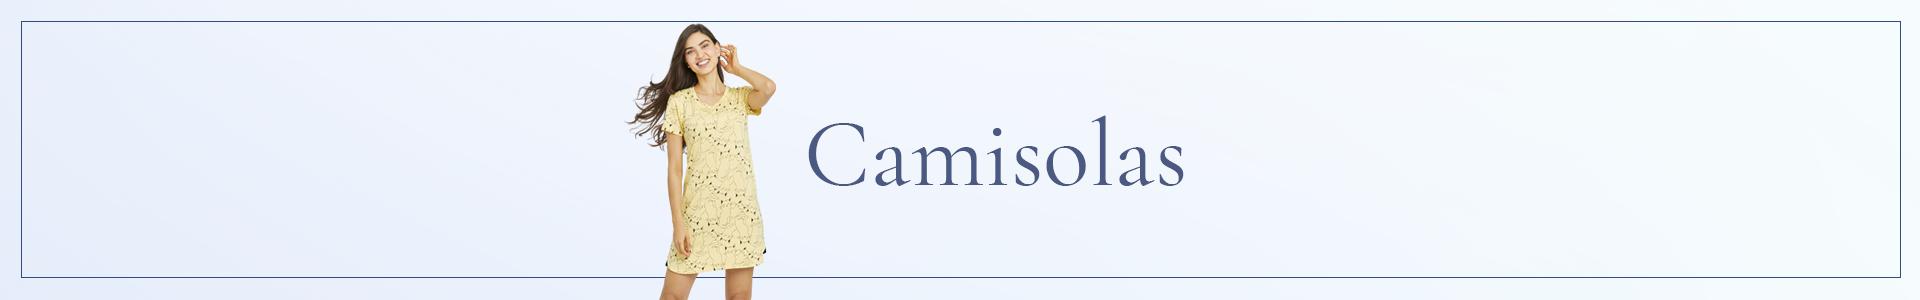 Banner Camisolas